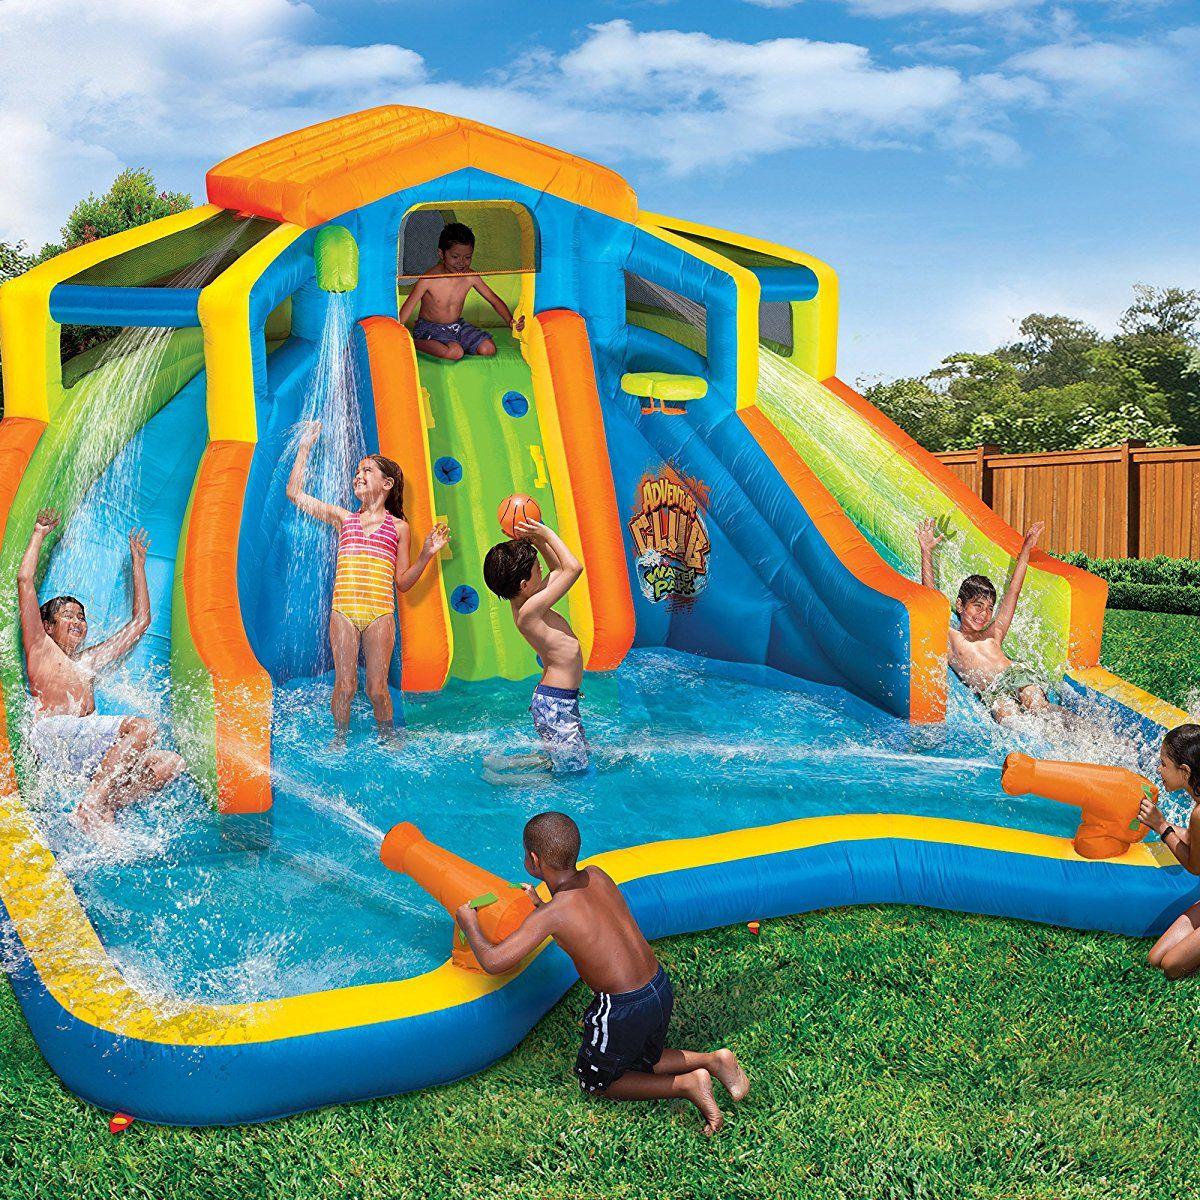 Banzai Inflatable Adventure Club Dual Slide And Pool Backyard